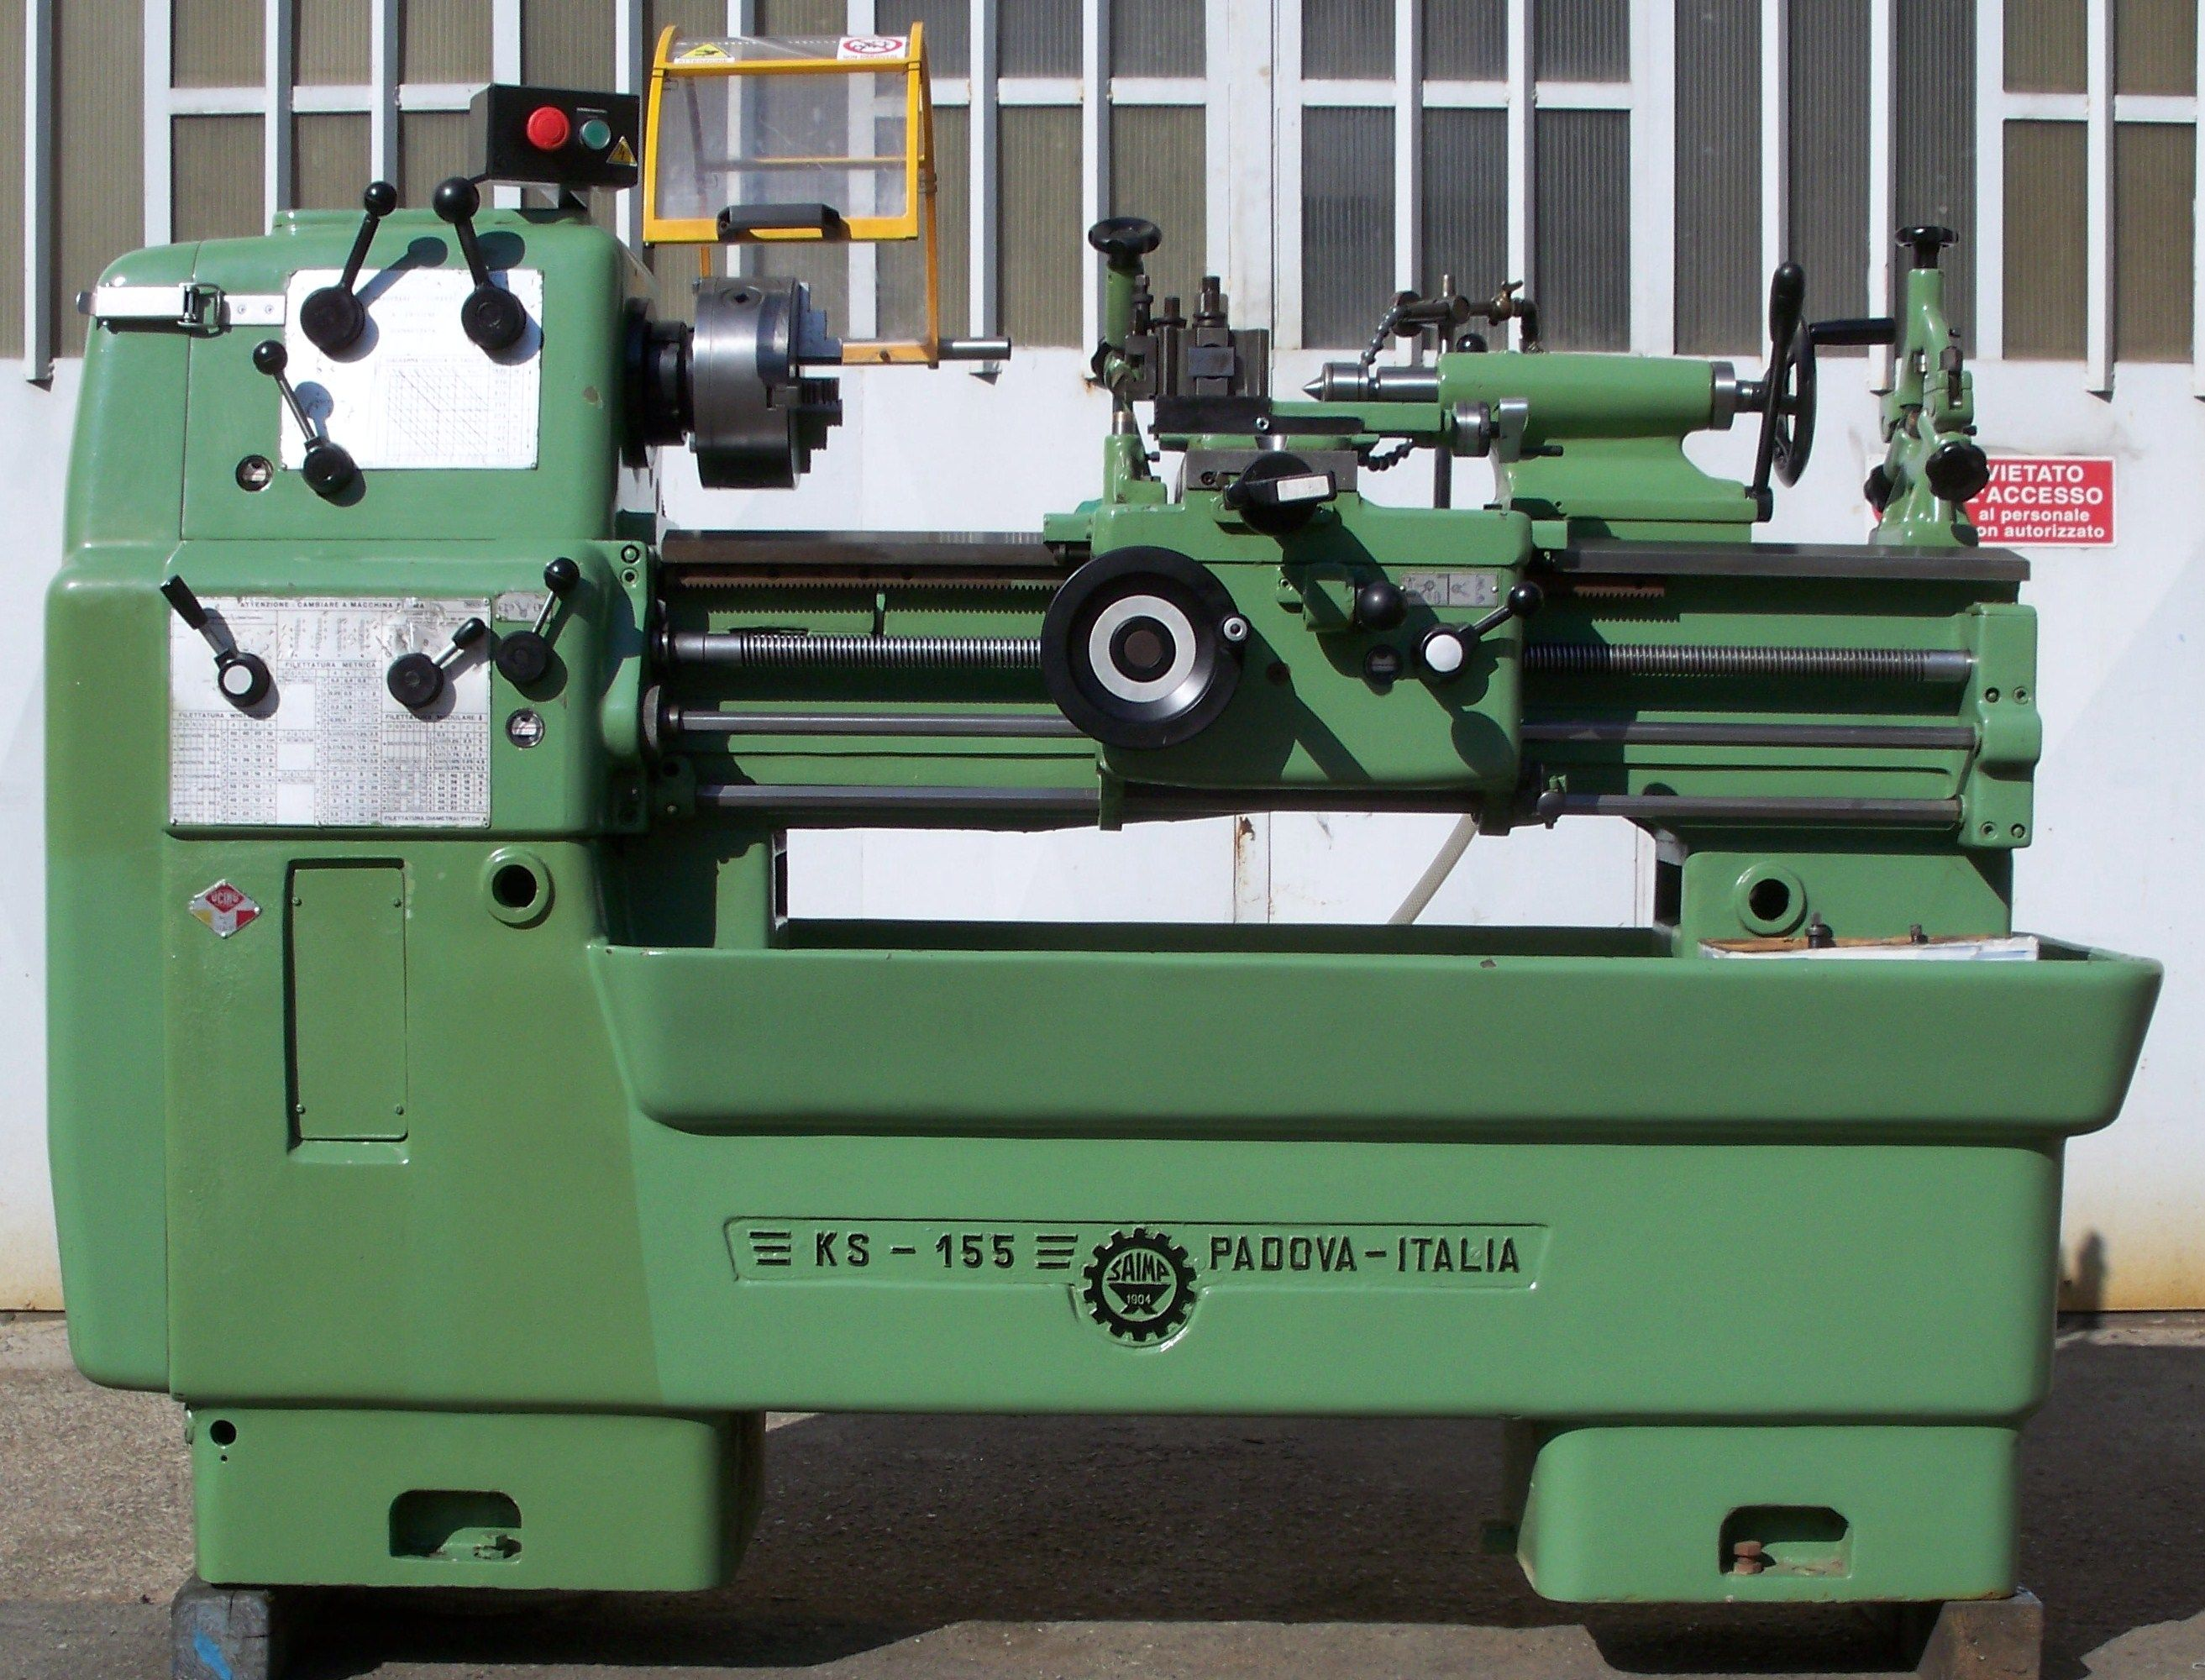 3300 euro tornio saimp ks 155 330 x 100 vendita usato for Tornio usato 220 volt